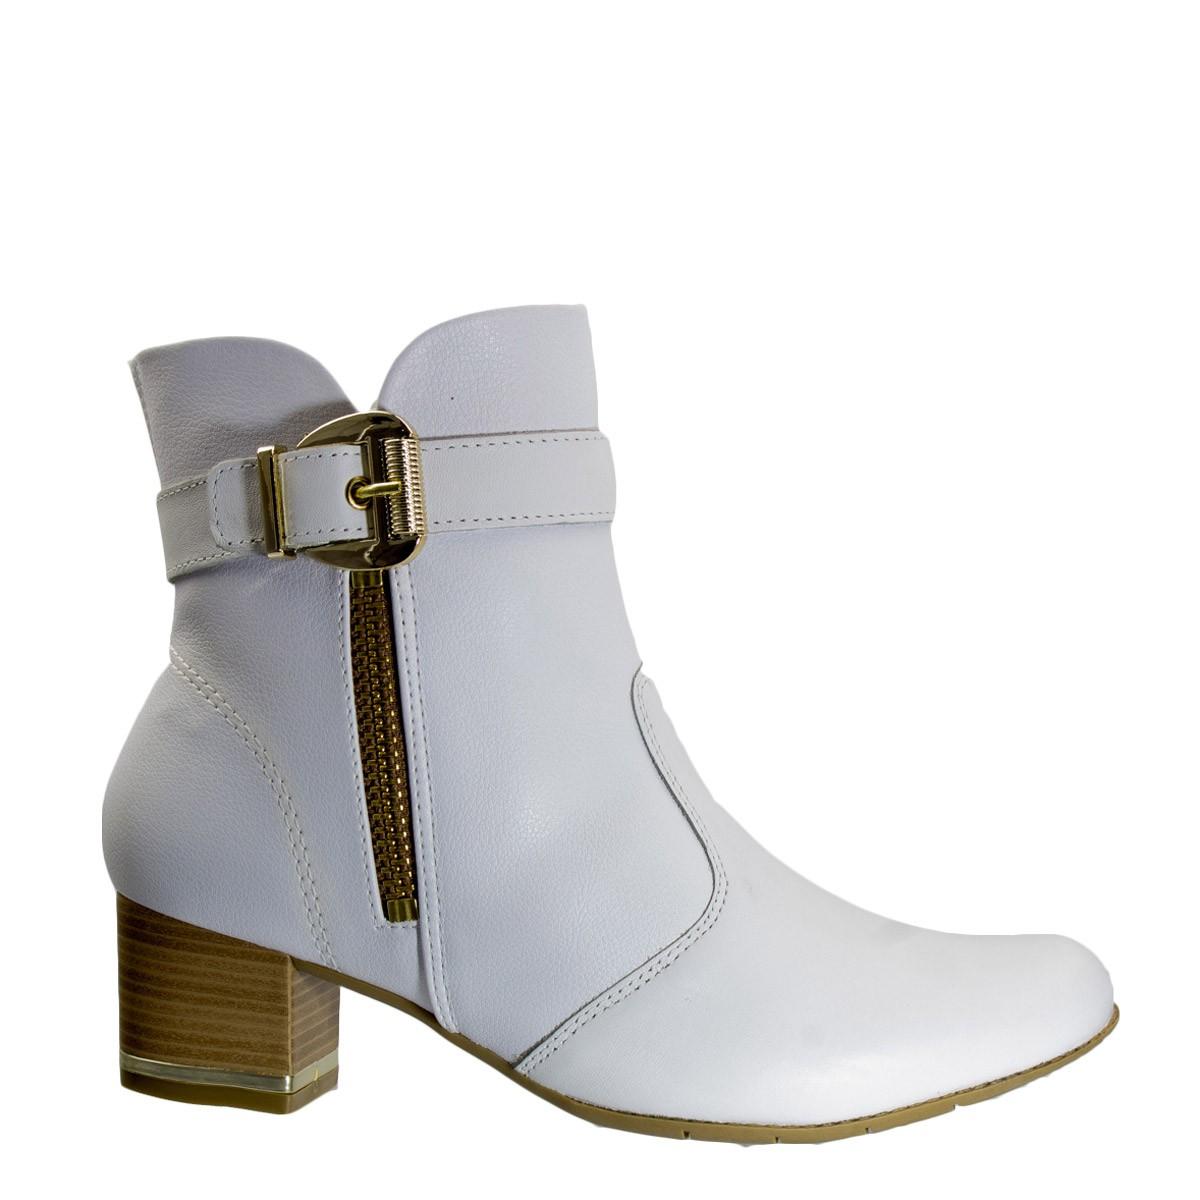 ad5102002 Bizz Store - Bota Feminina Comfortflex Branca Cano Curto